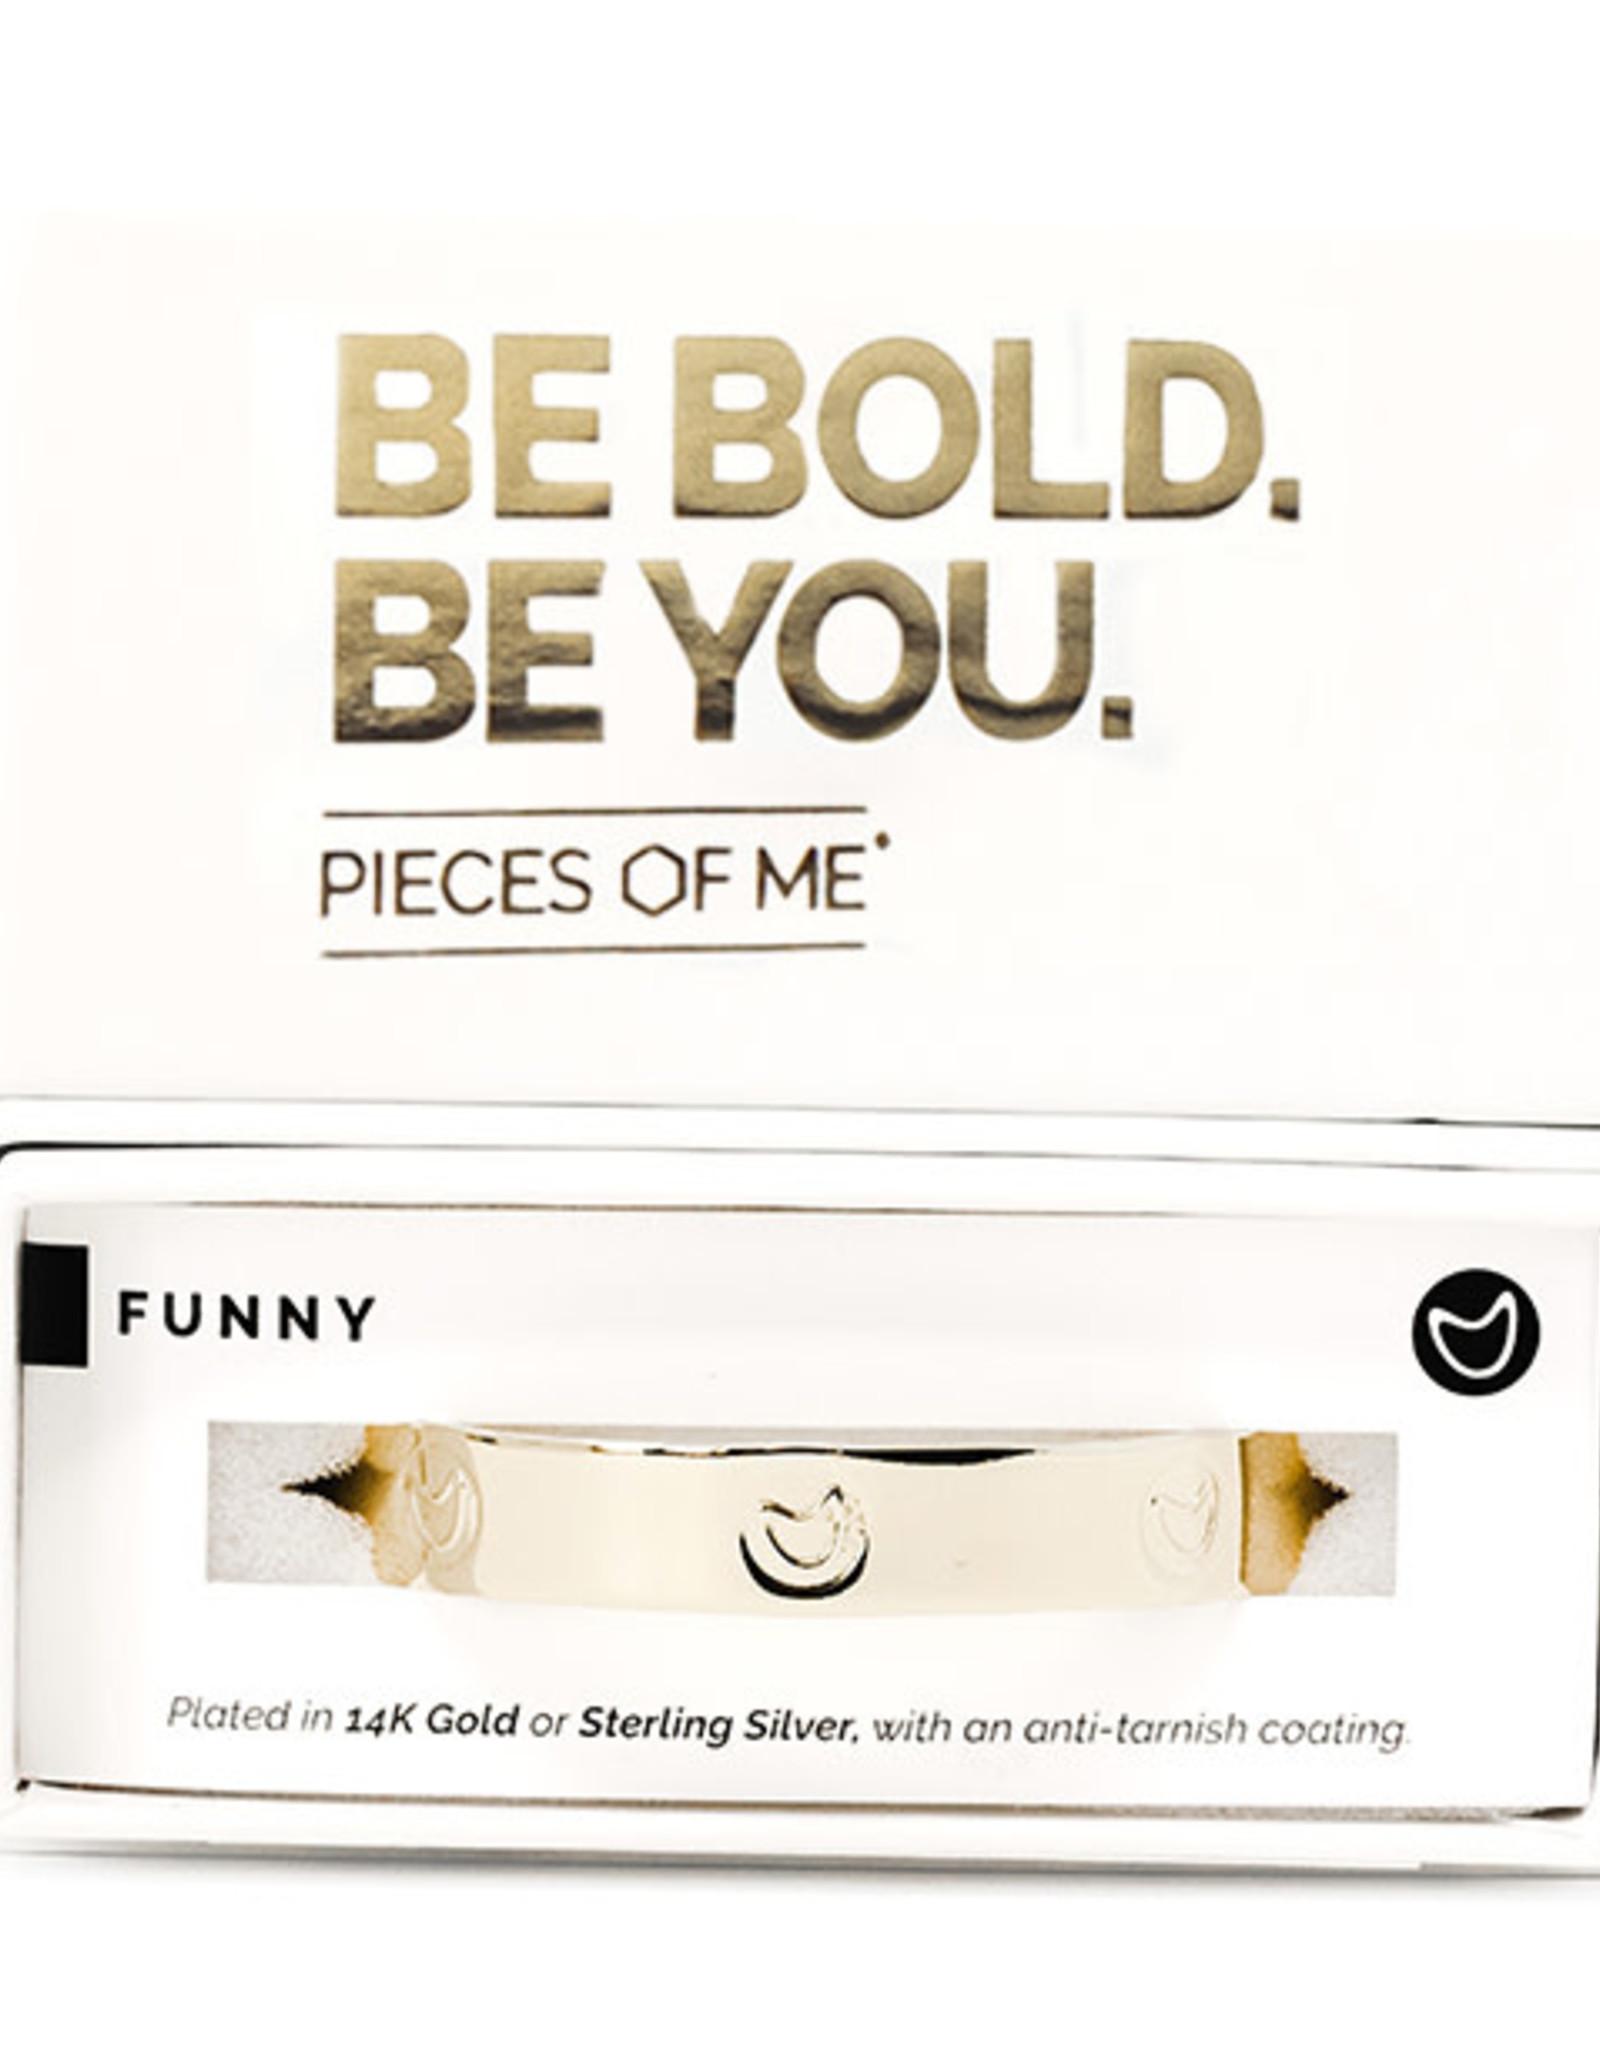 Pieces of Me Bracelet Funny Gold